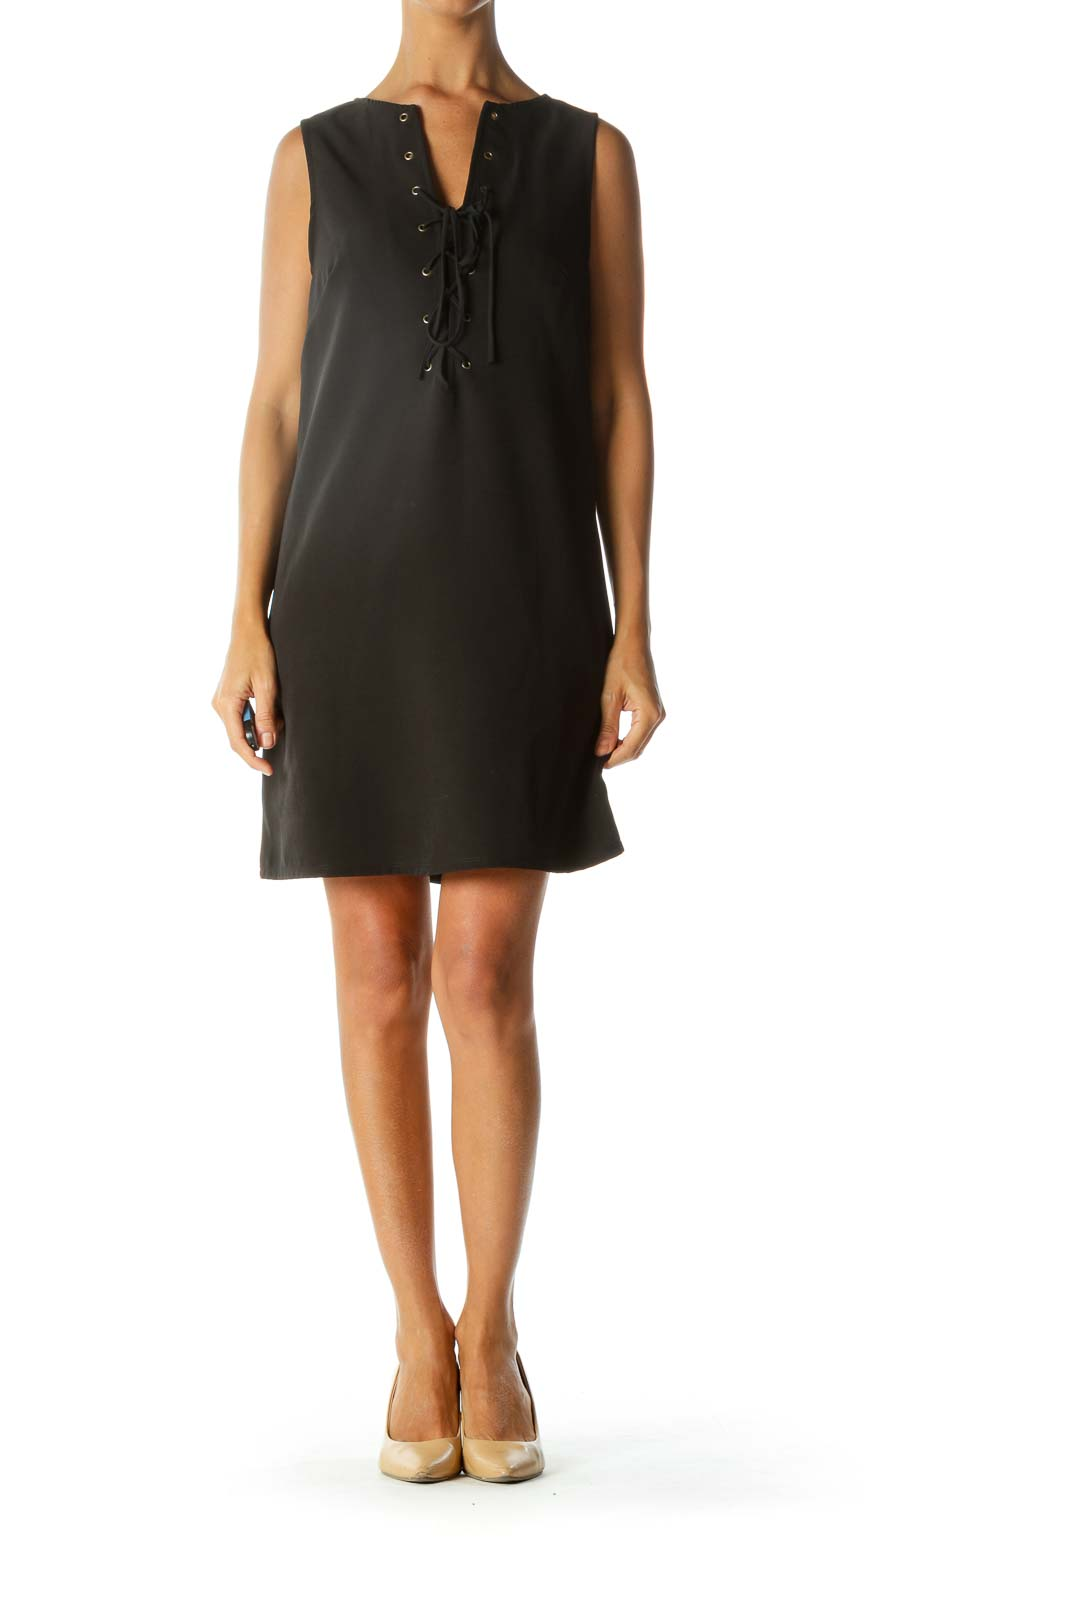 Black Crisscross Front Sleeveless Cocktail Dress